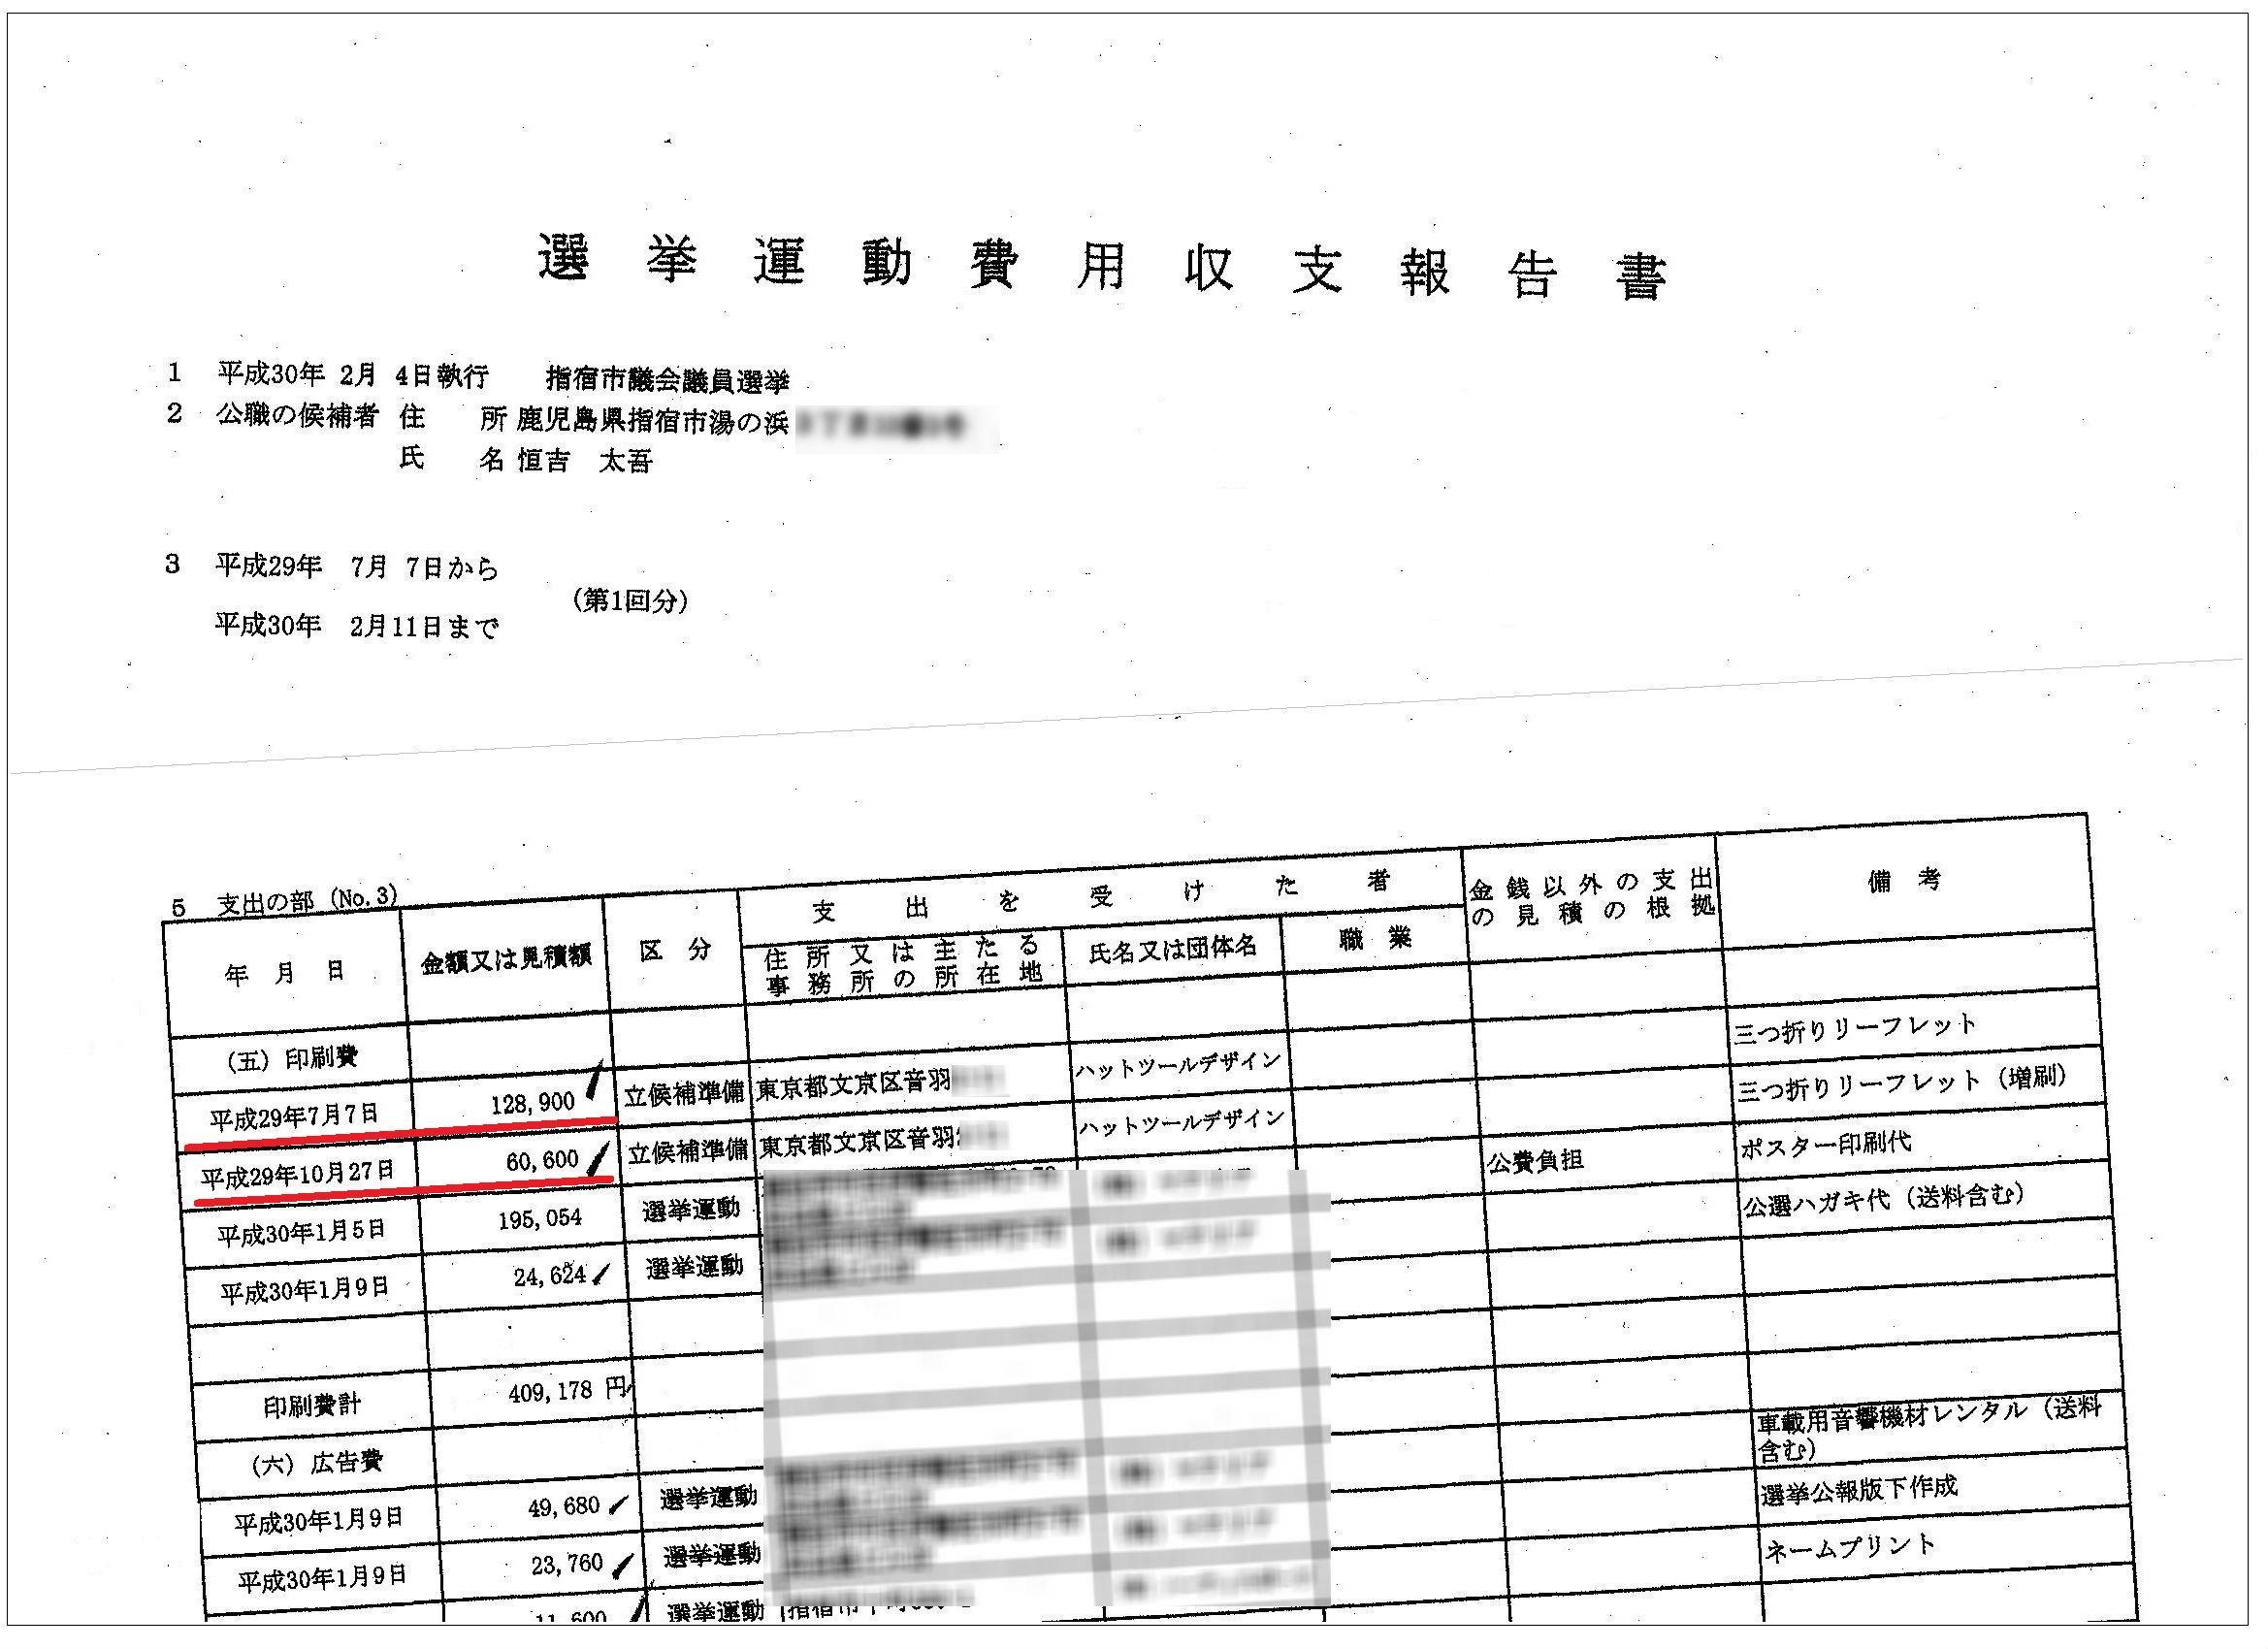 http://hunter-investigate.jp/news/816043429e967aa04427468e7408a3f9b6fdae6a.jpg